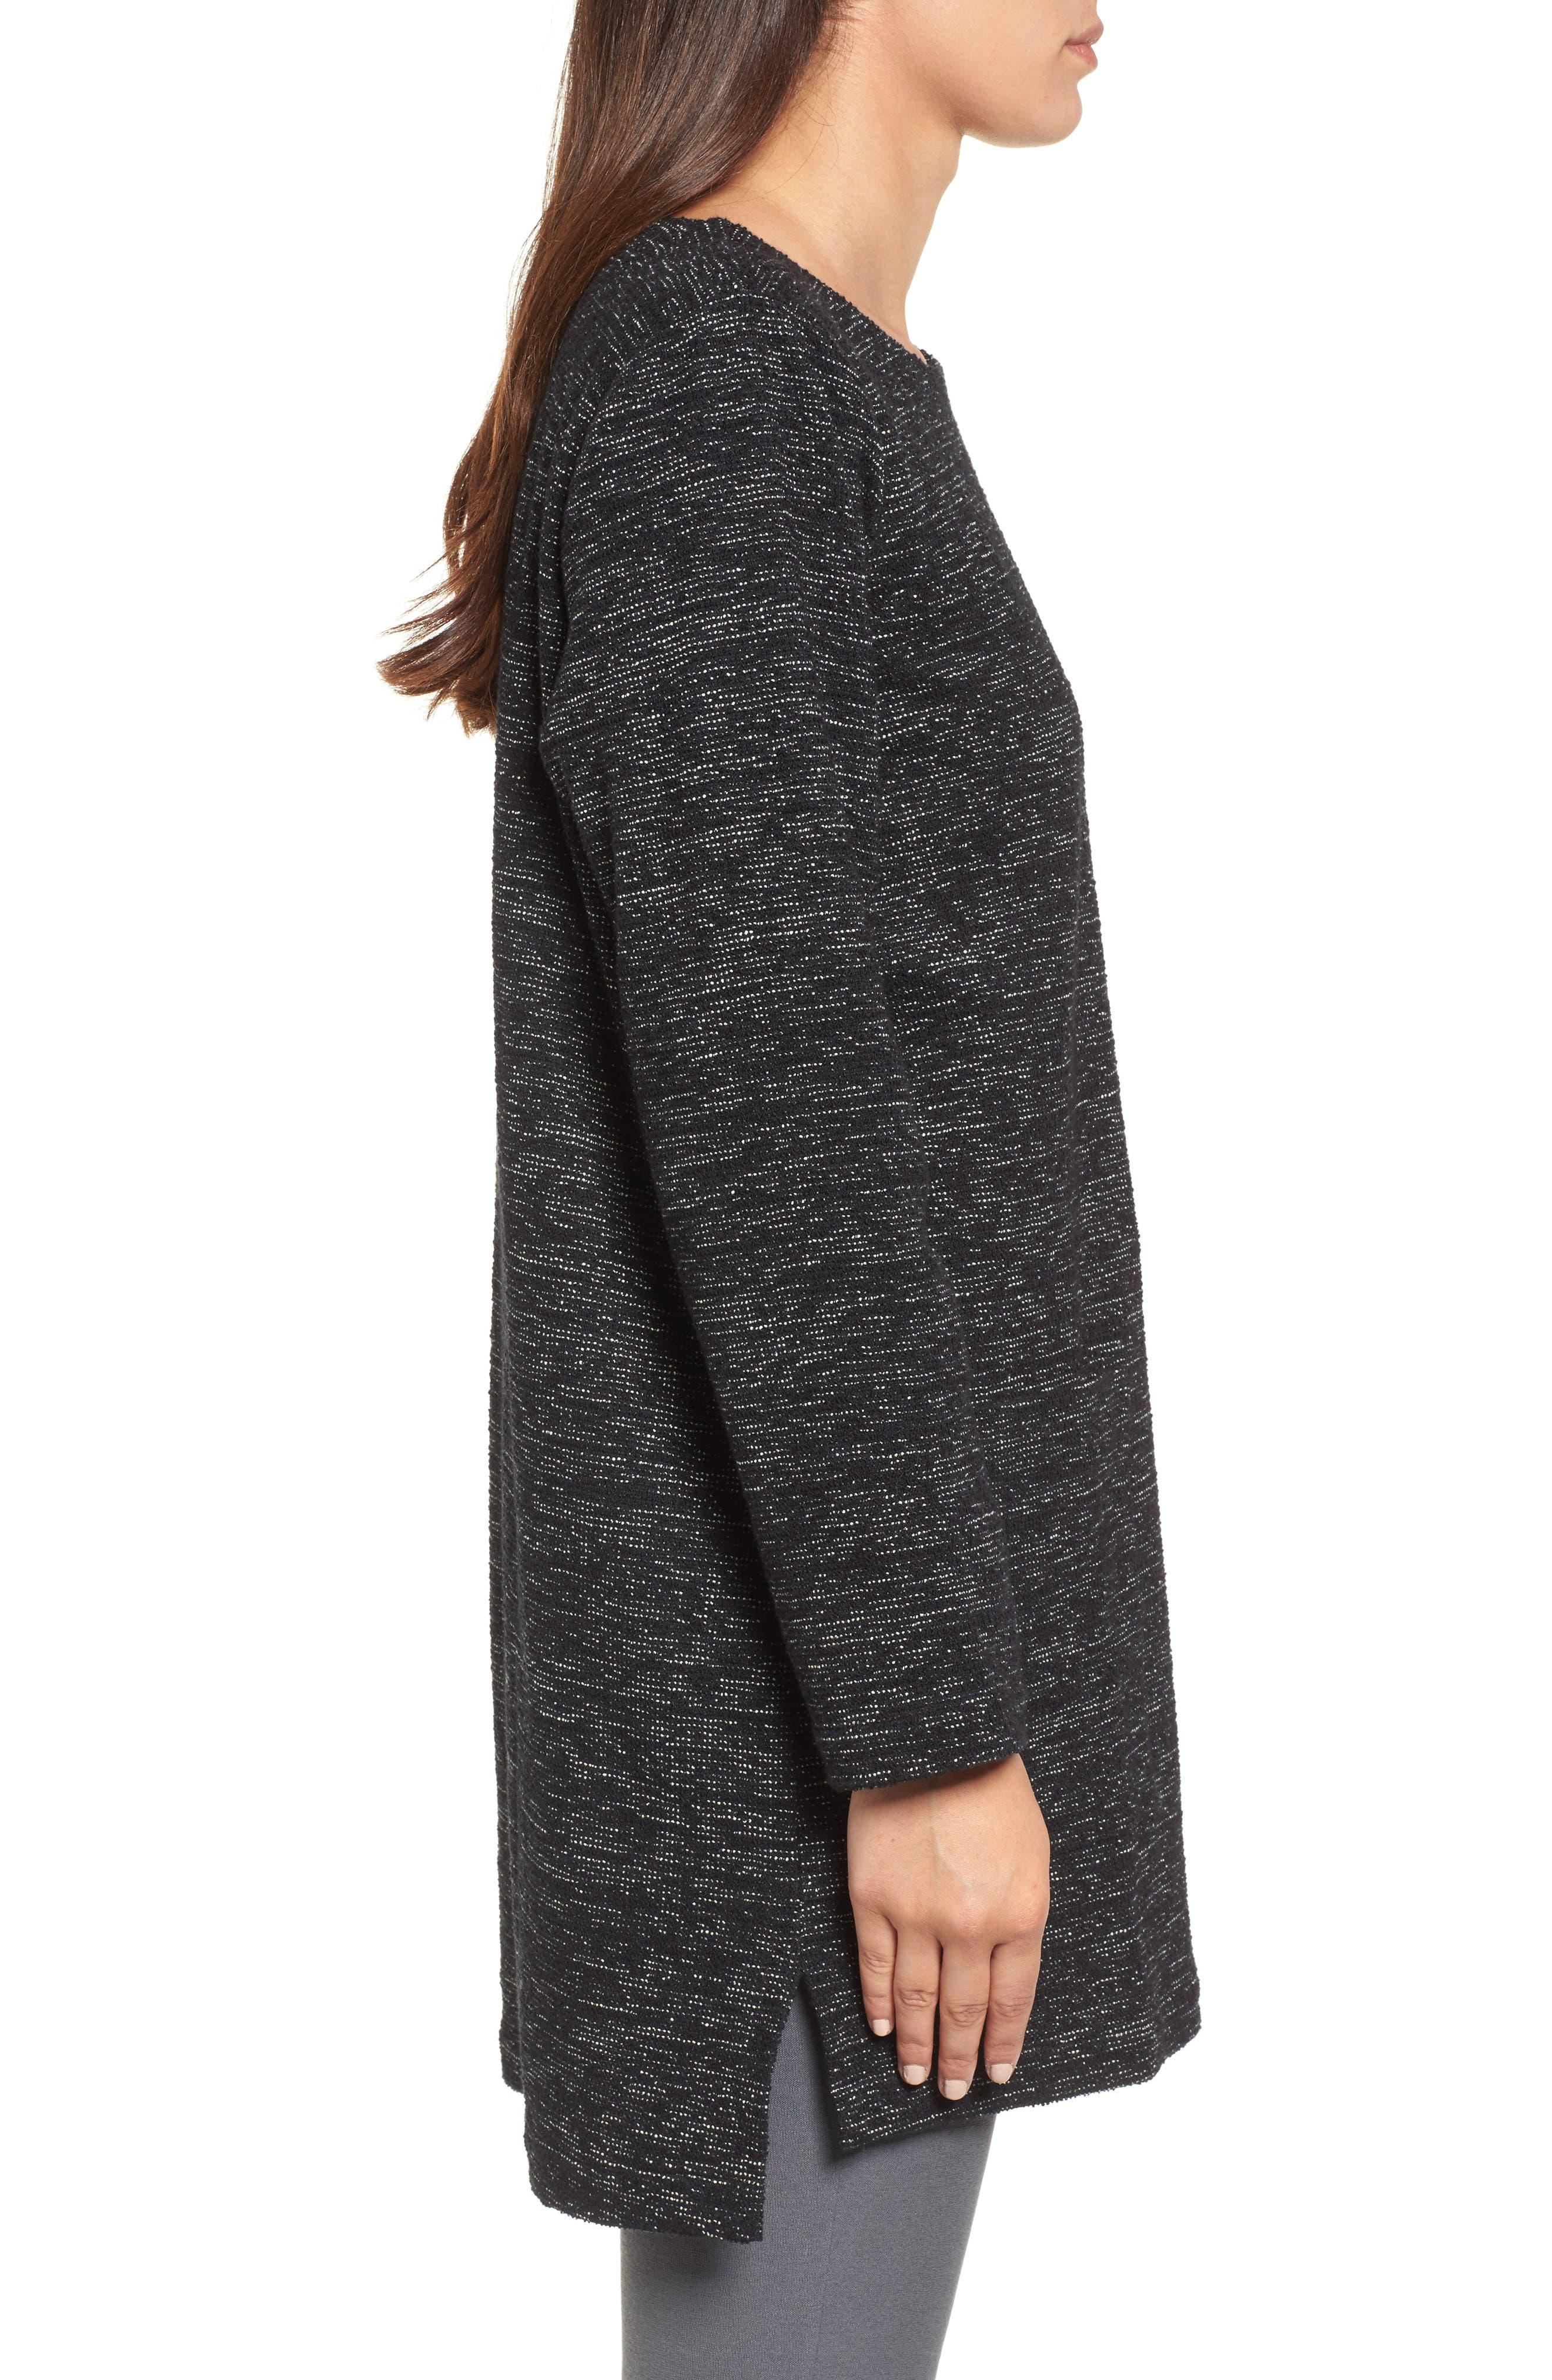 Boxy Organic Cotton Blend Tunic Sweater,                             Alternate thumbnail 3, color,                             Black